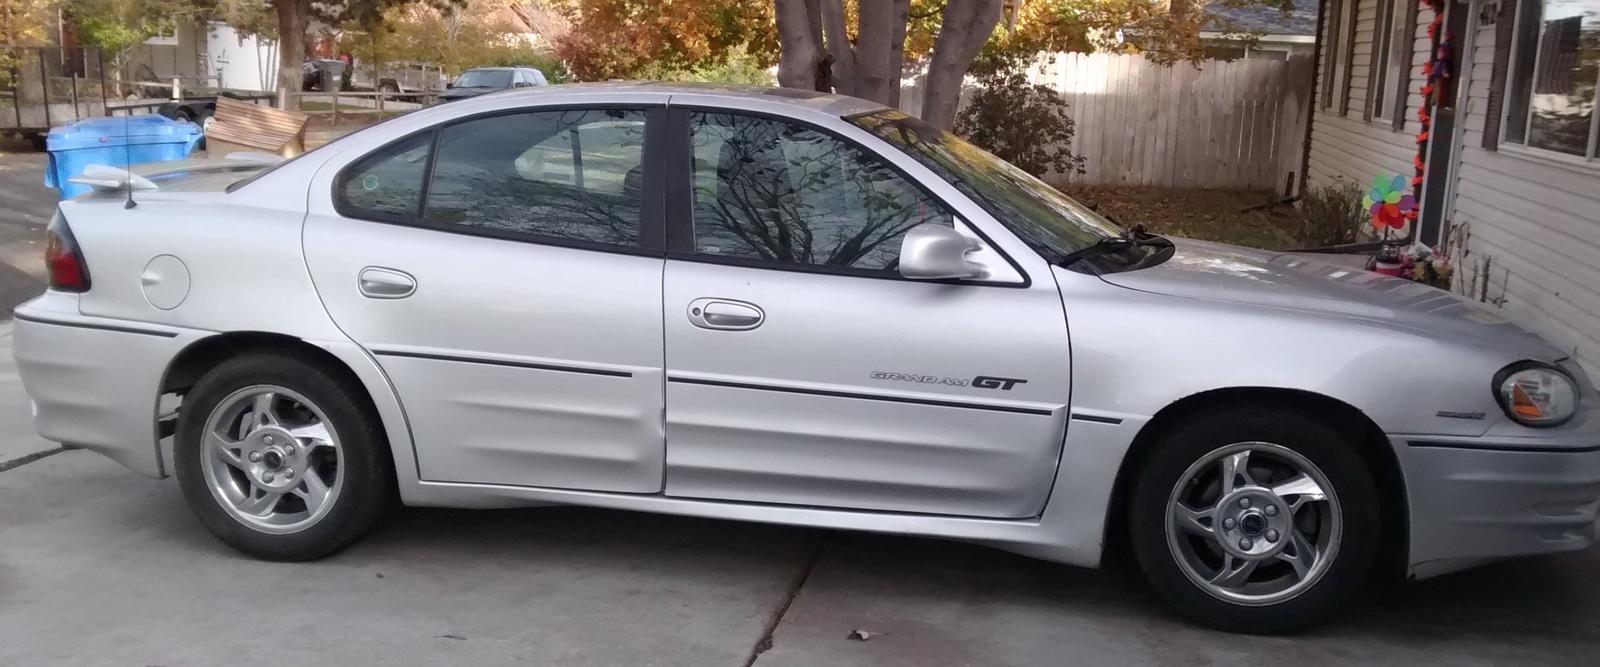 Pontiac Grand Am Questions - GAS SMELL WHEN I START MY CAR - CarGurus